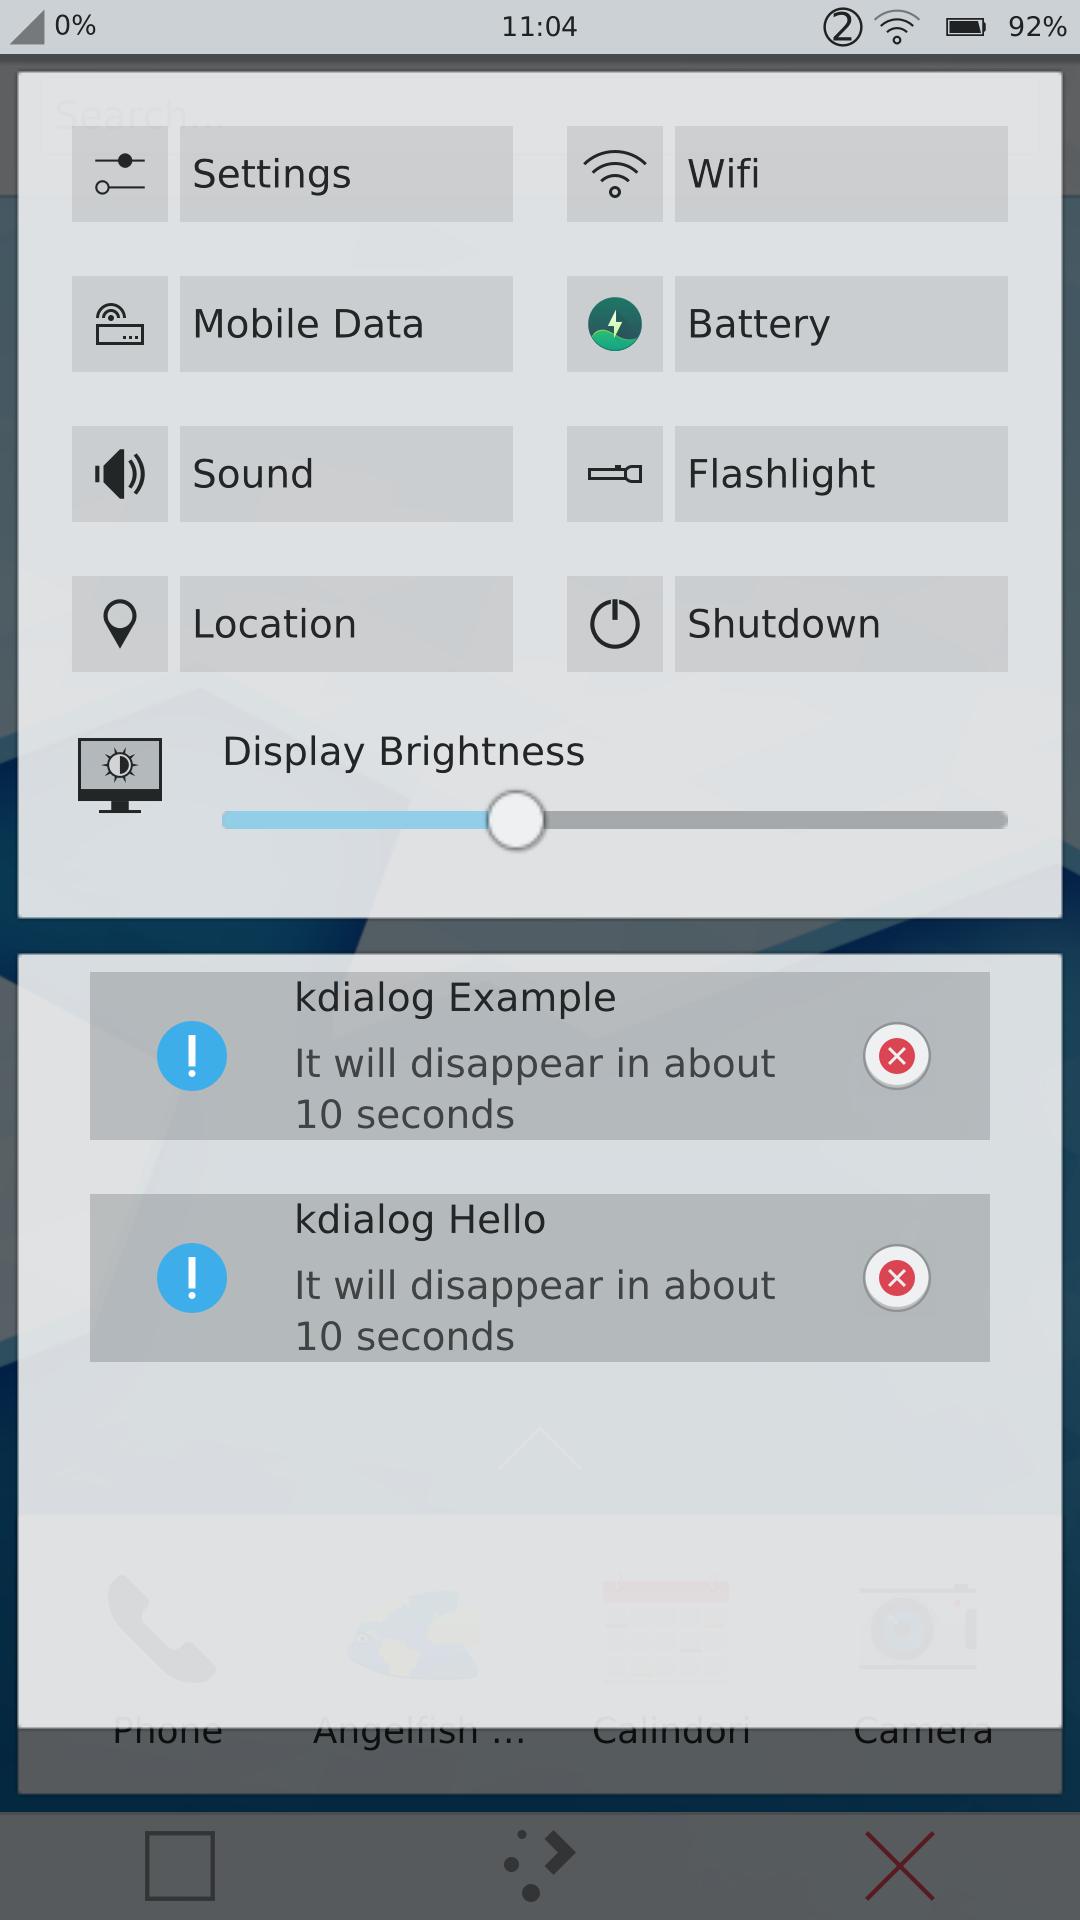 img/screenshots/plamo-notifcations.png